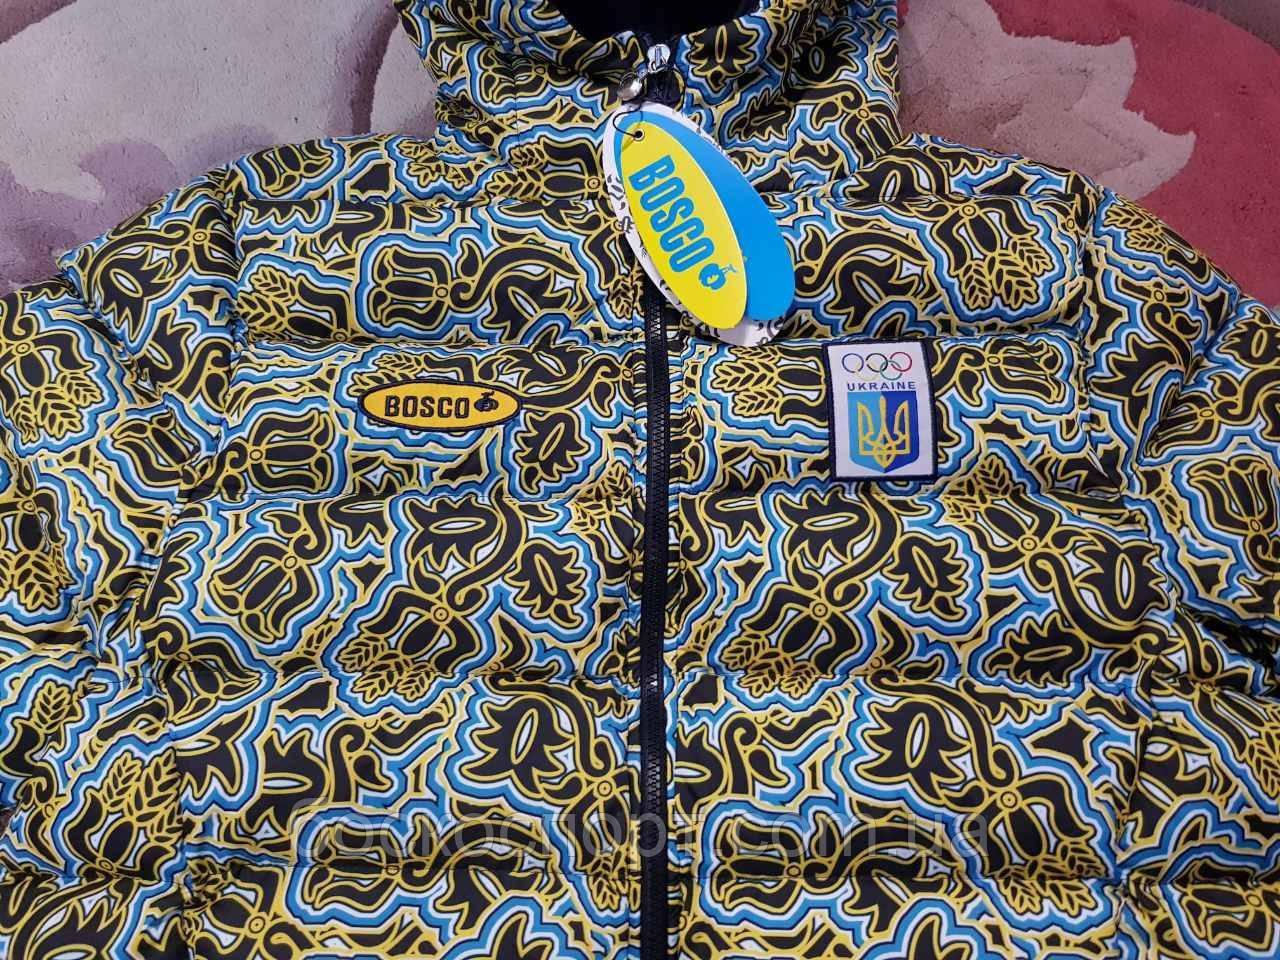 eb445a16da4c Пуховики - куртки bosco sport Украина - BOSCOSPORT UKRAINE +380958022999 в  Одессе